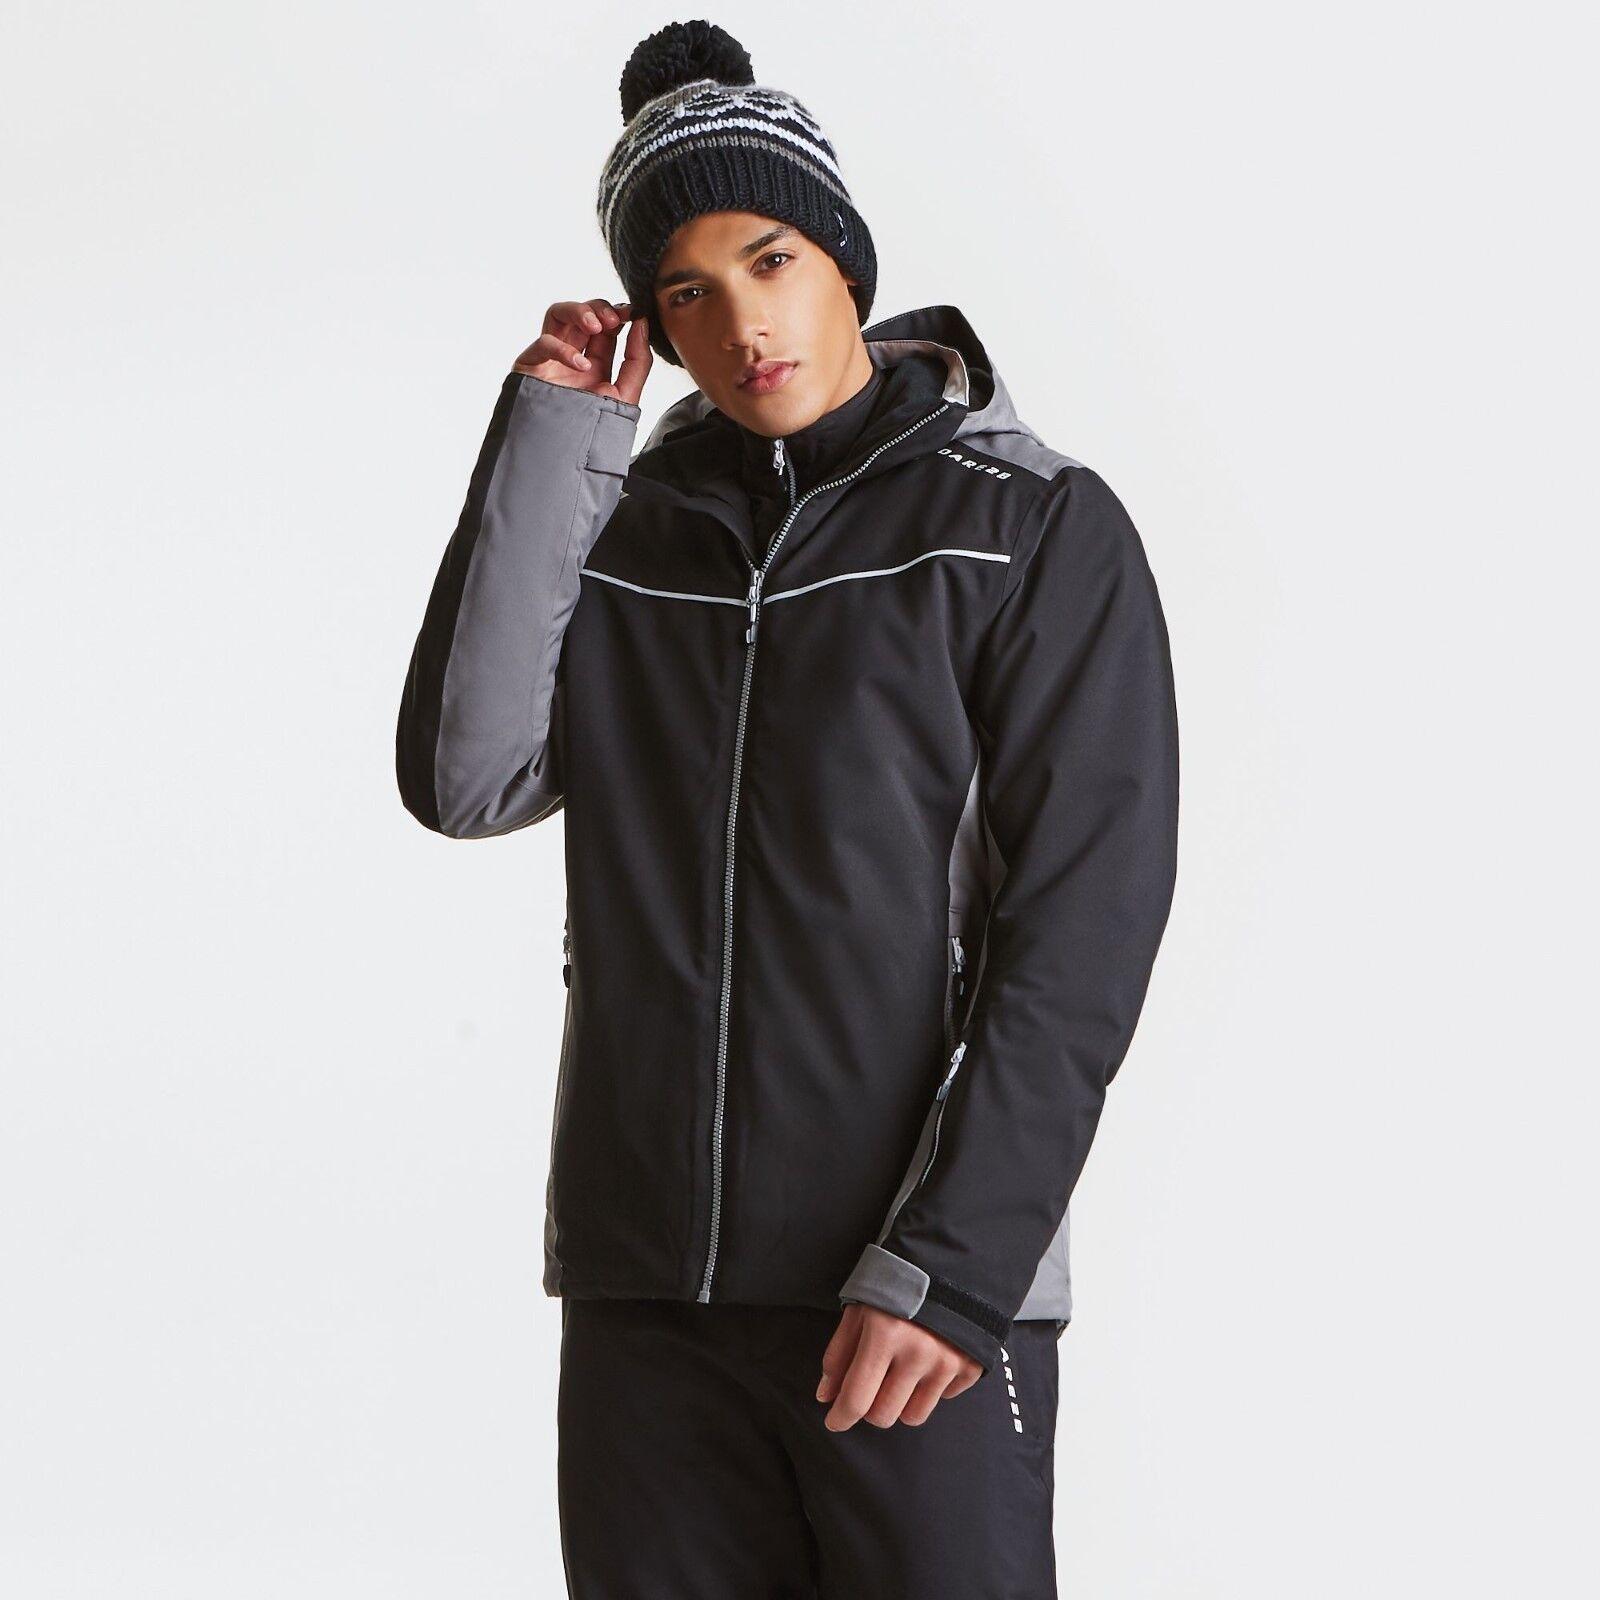 DARE2B VIGOUR Mens Ski Board Jacket schwarz Größes M - 3XL